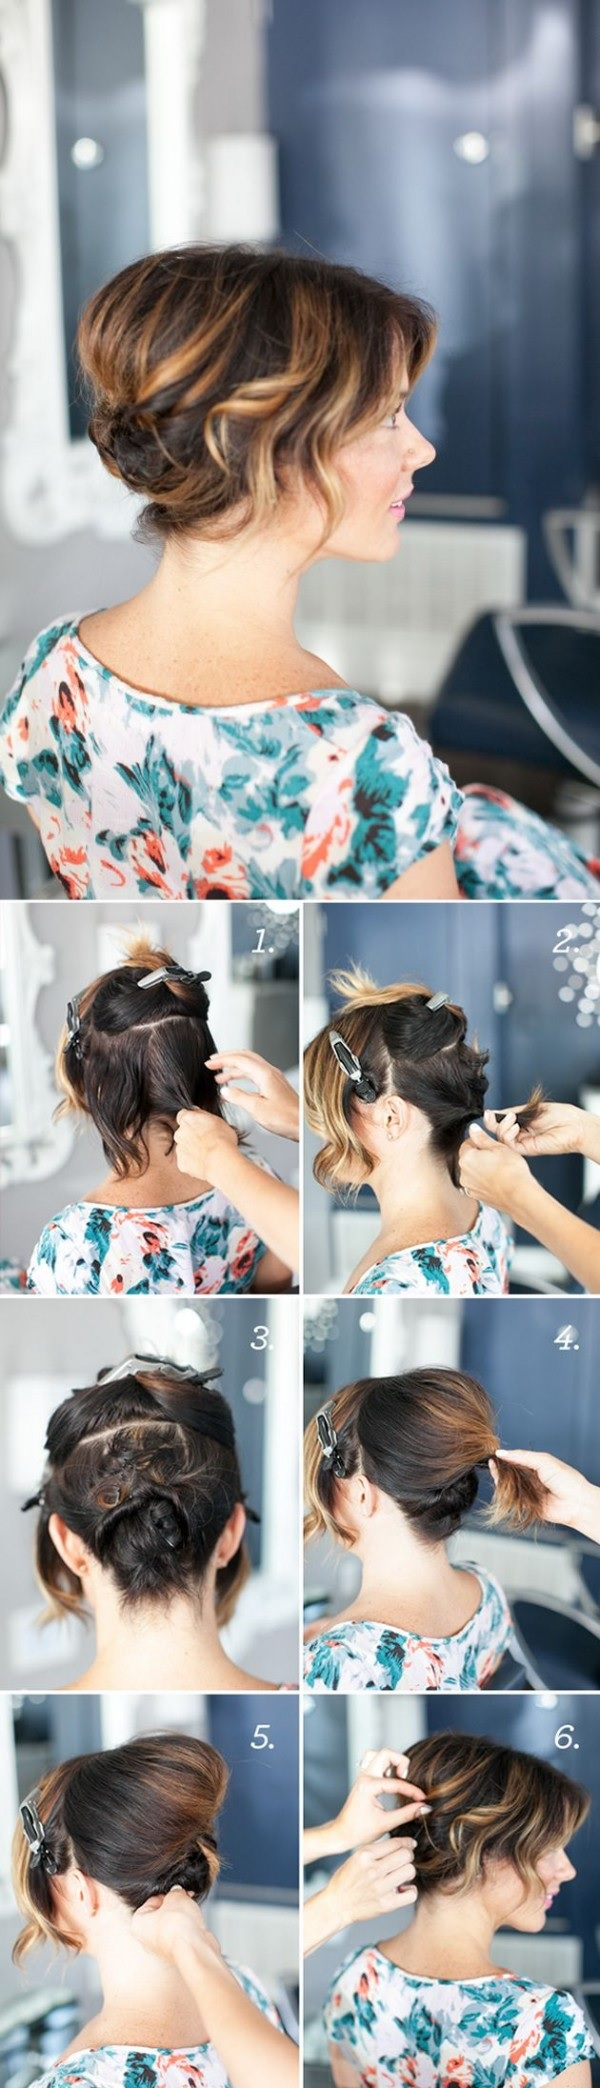 el pelo-corto-2